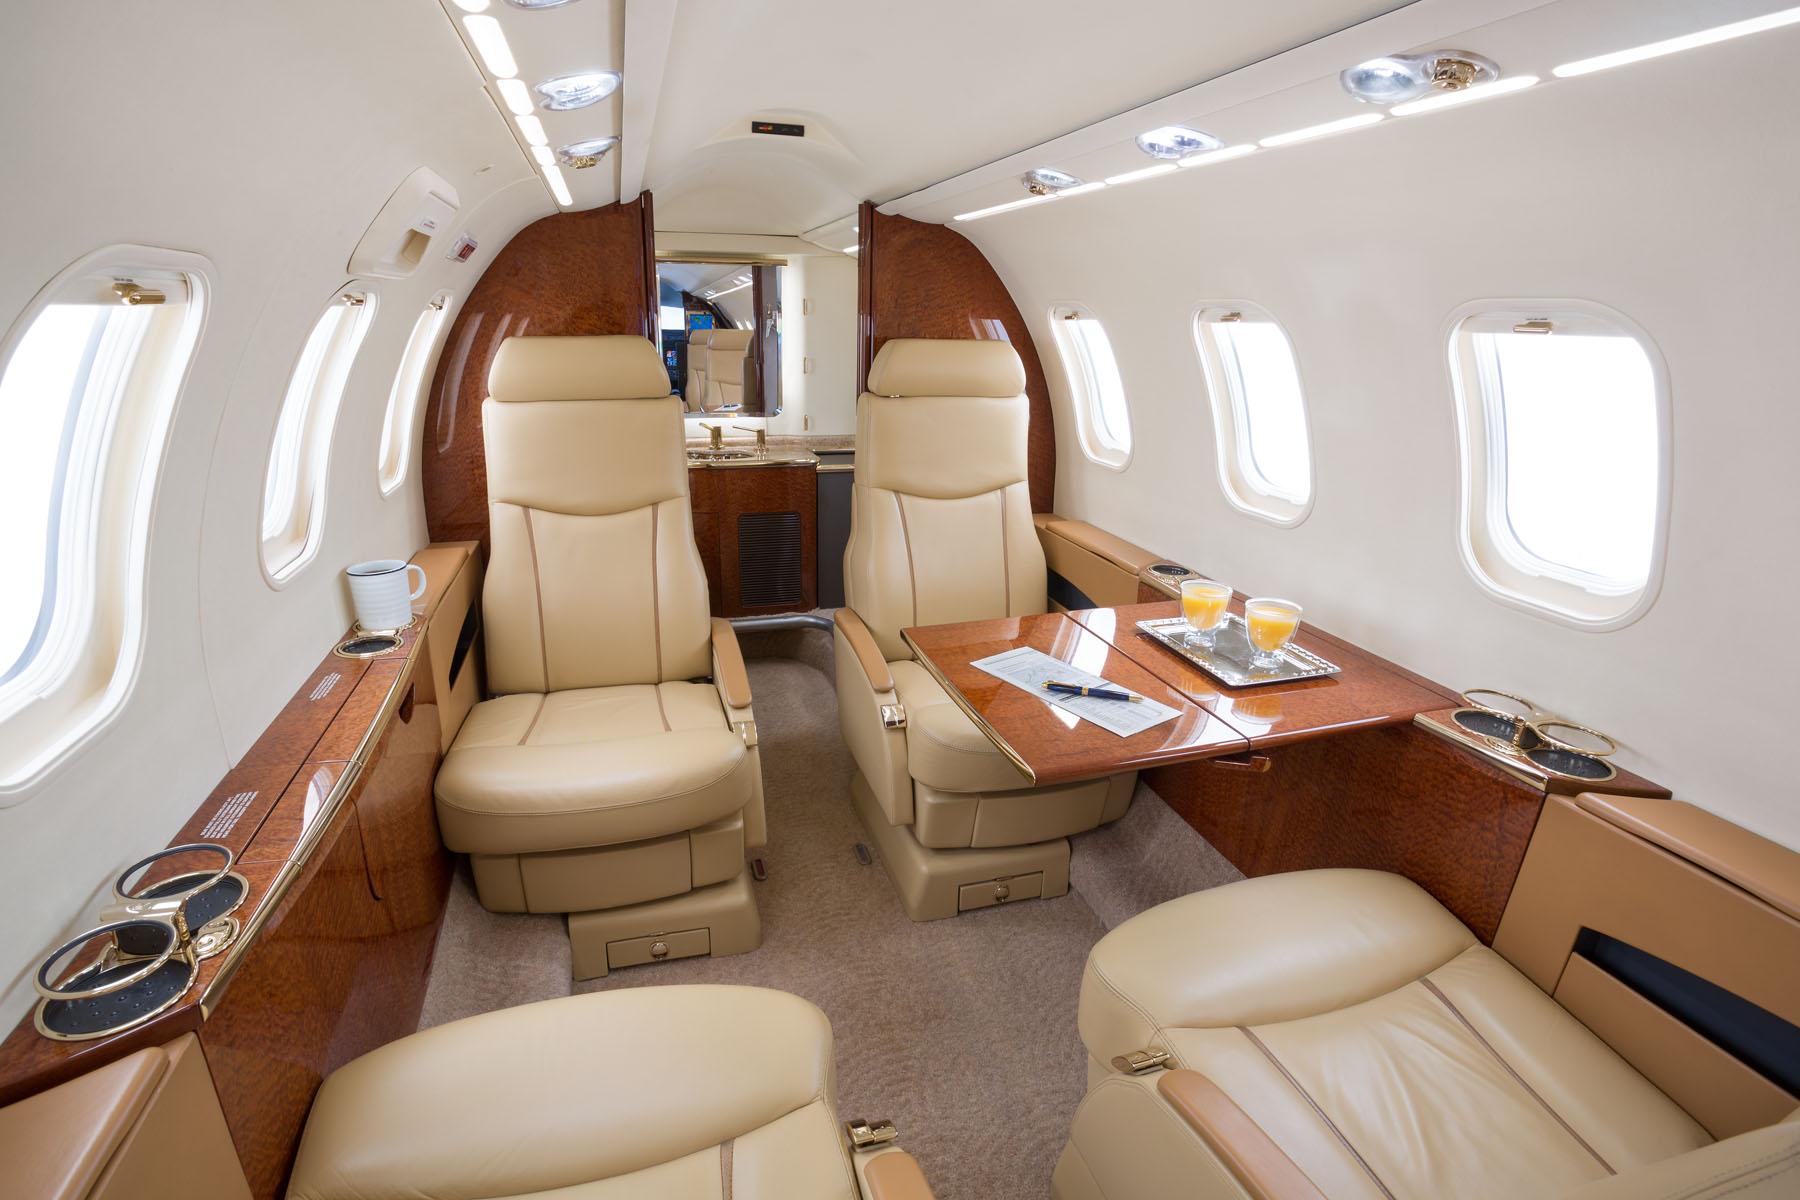 Lear-45_Interior2_Light-Jet_Legacy_Aviation_Private_Jet_NetJets_Jet_Charter_TEB_VNY_MIA_PBI_FRG_SFO_FLL_FXE_BED.jpg